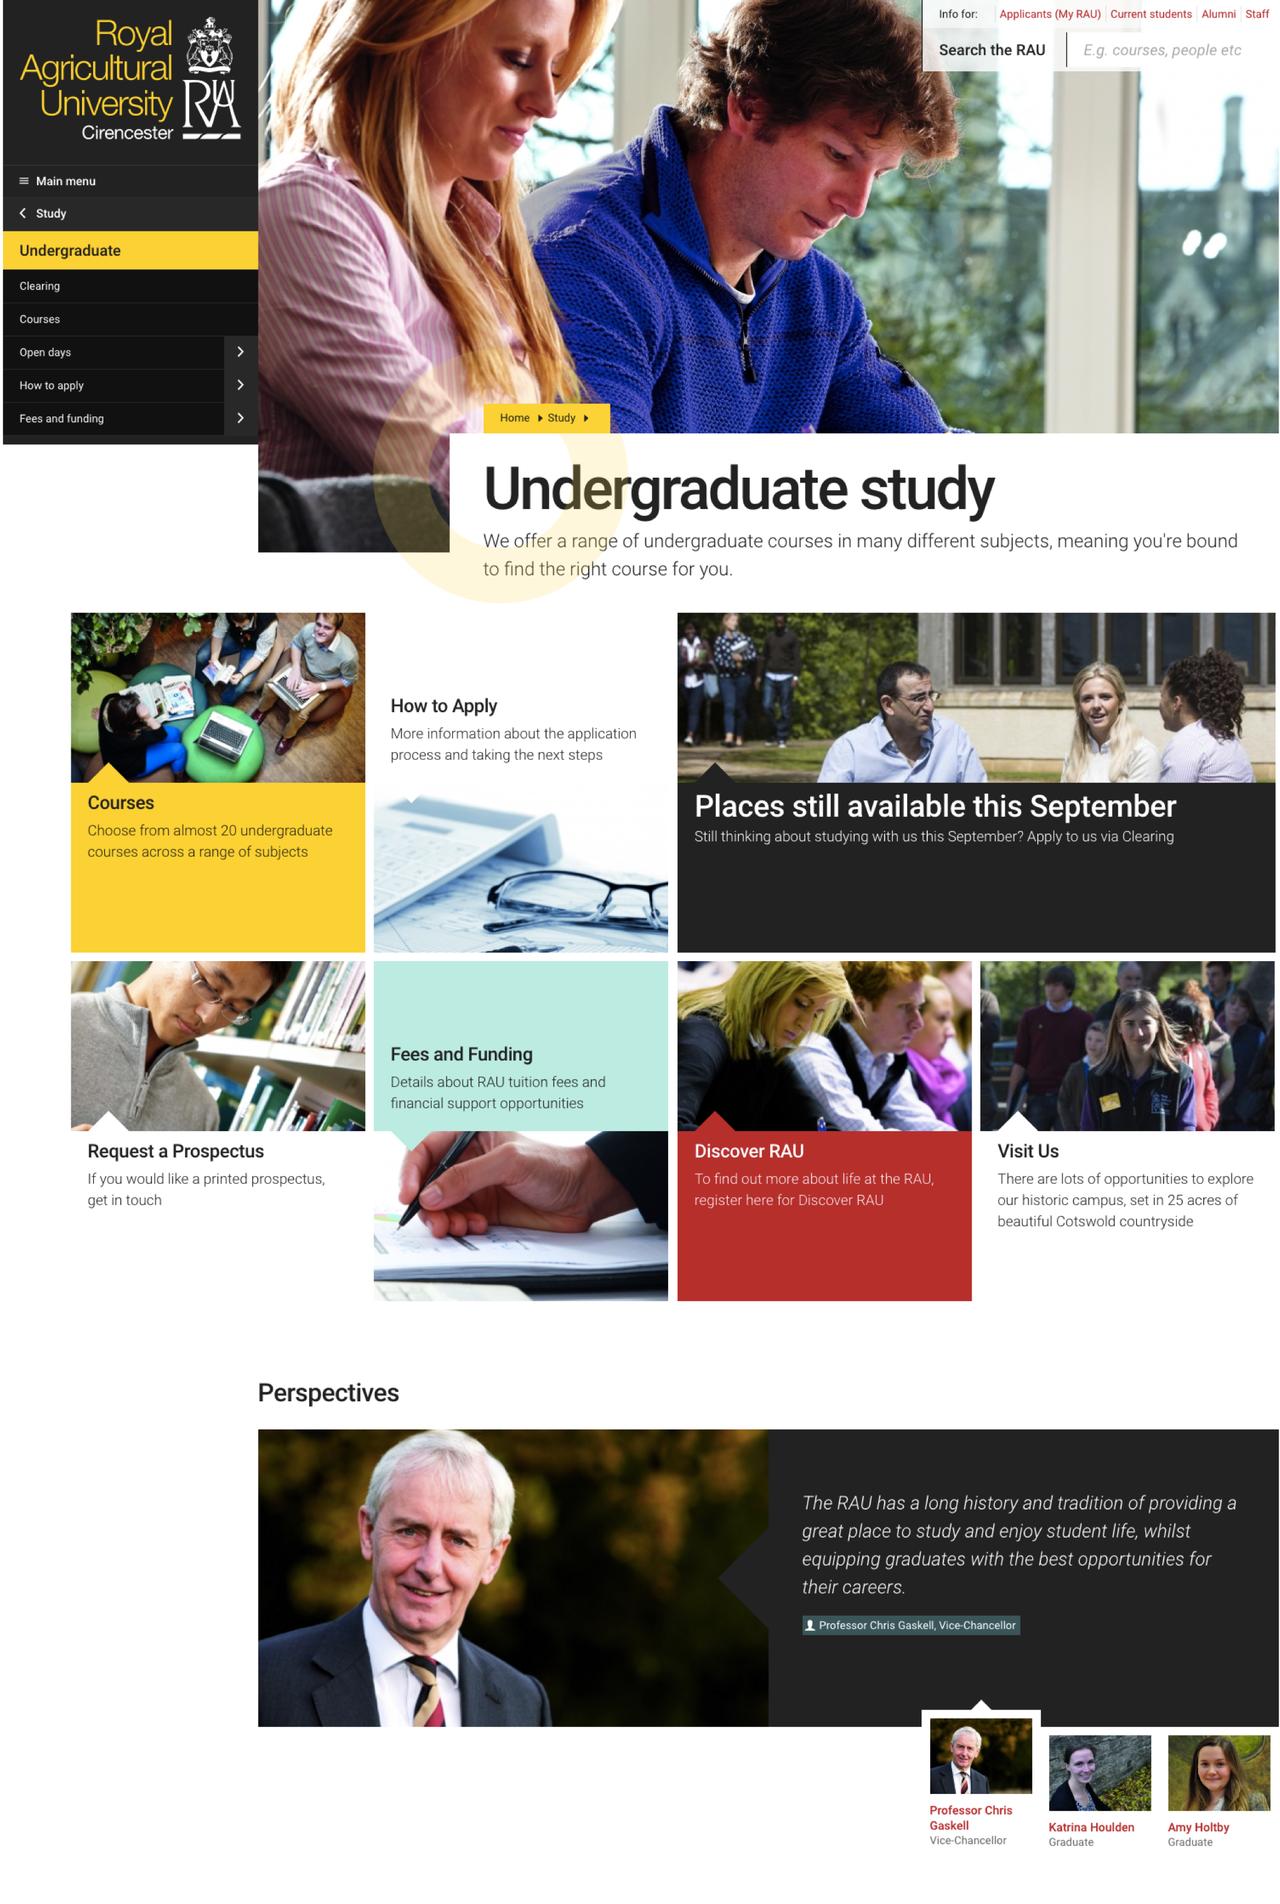 Royal Agricultural University Website